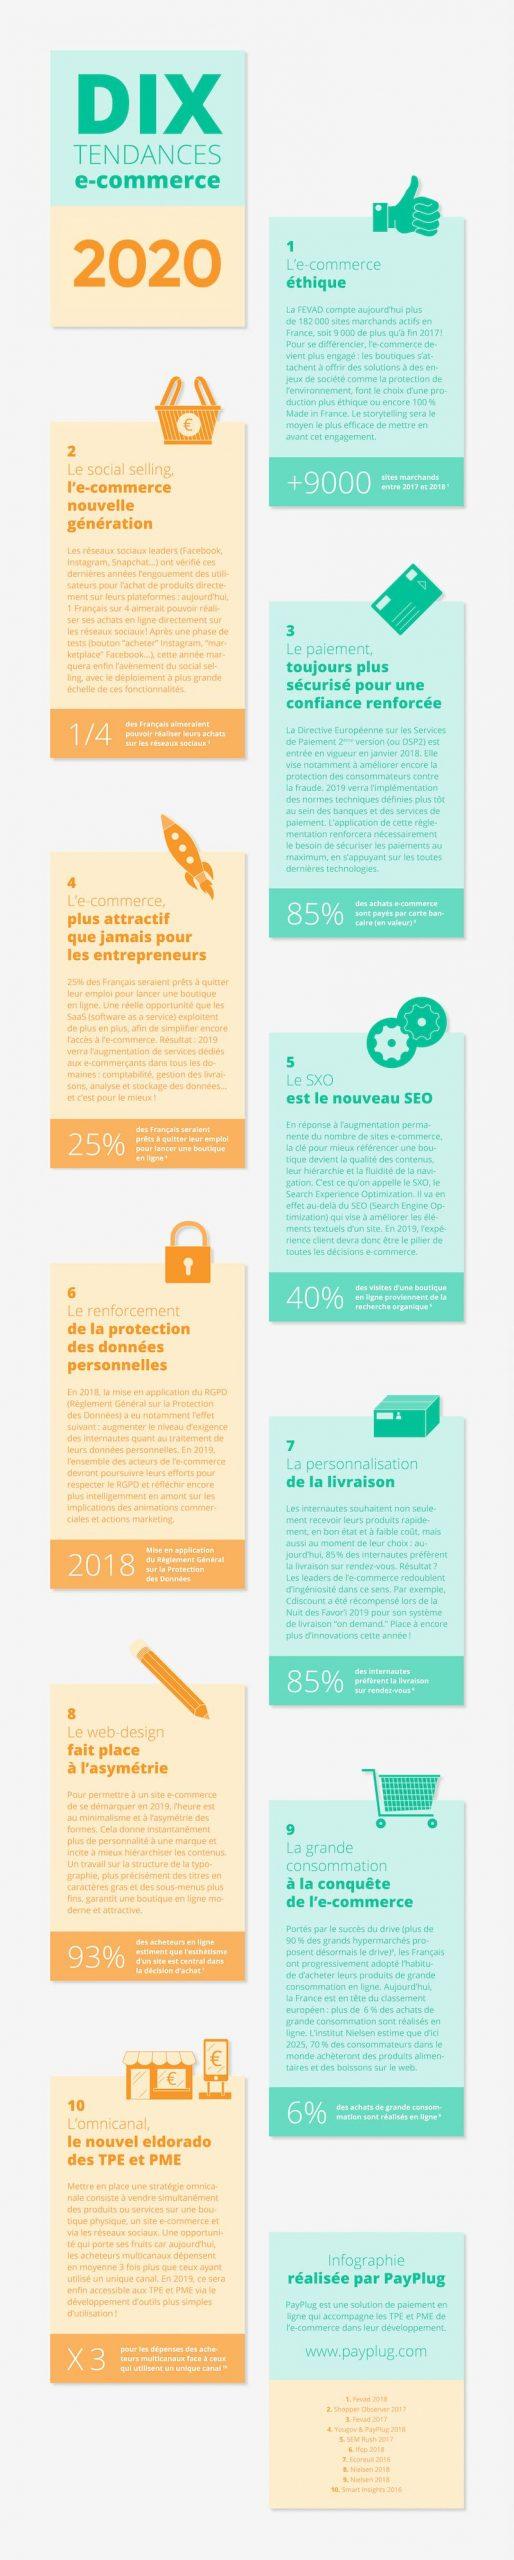 Infographie tendance e-commerce